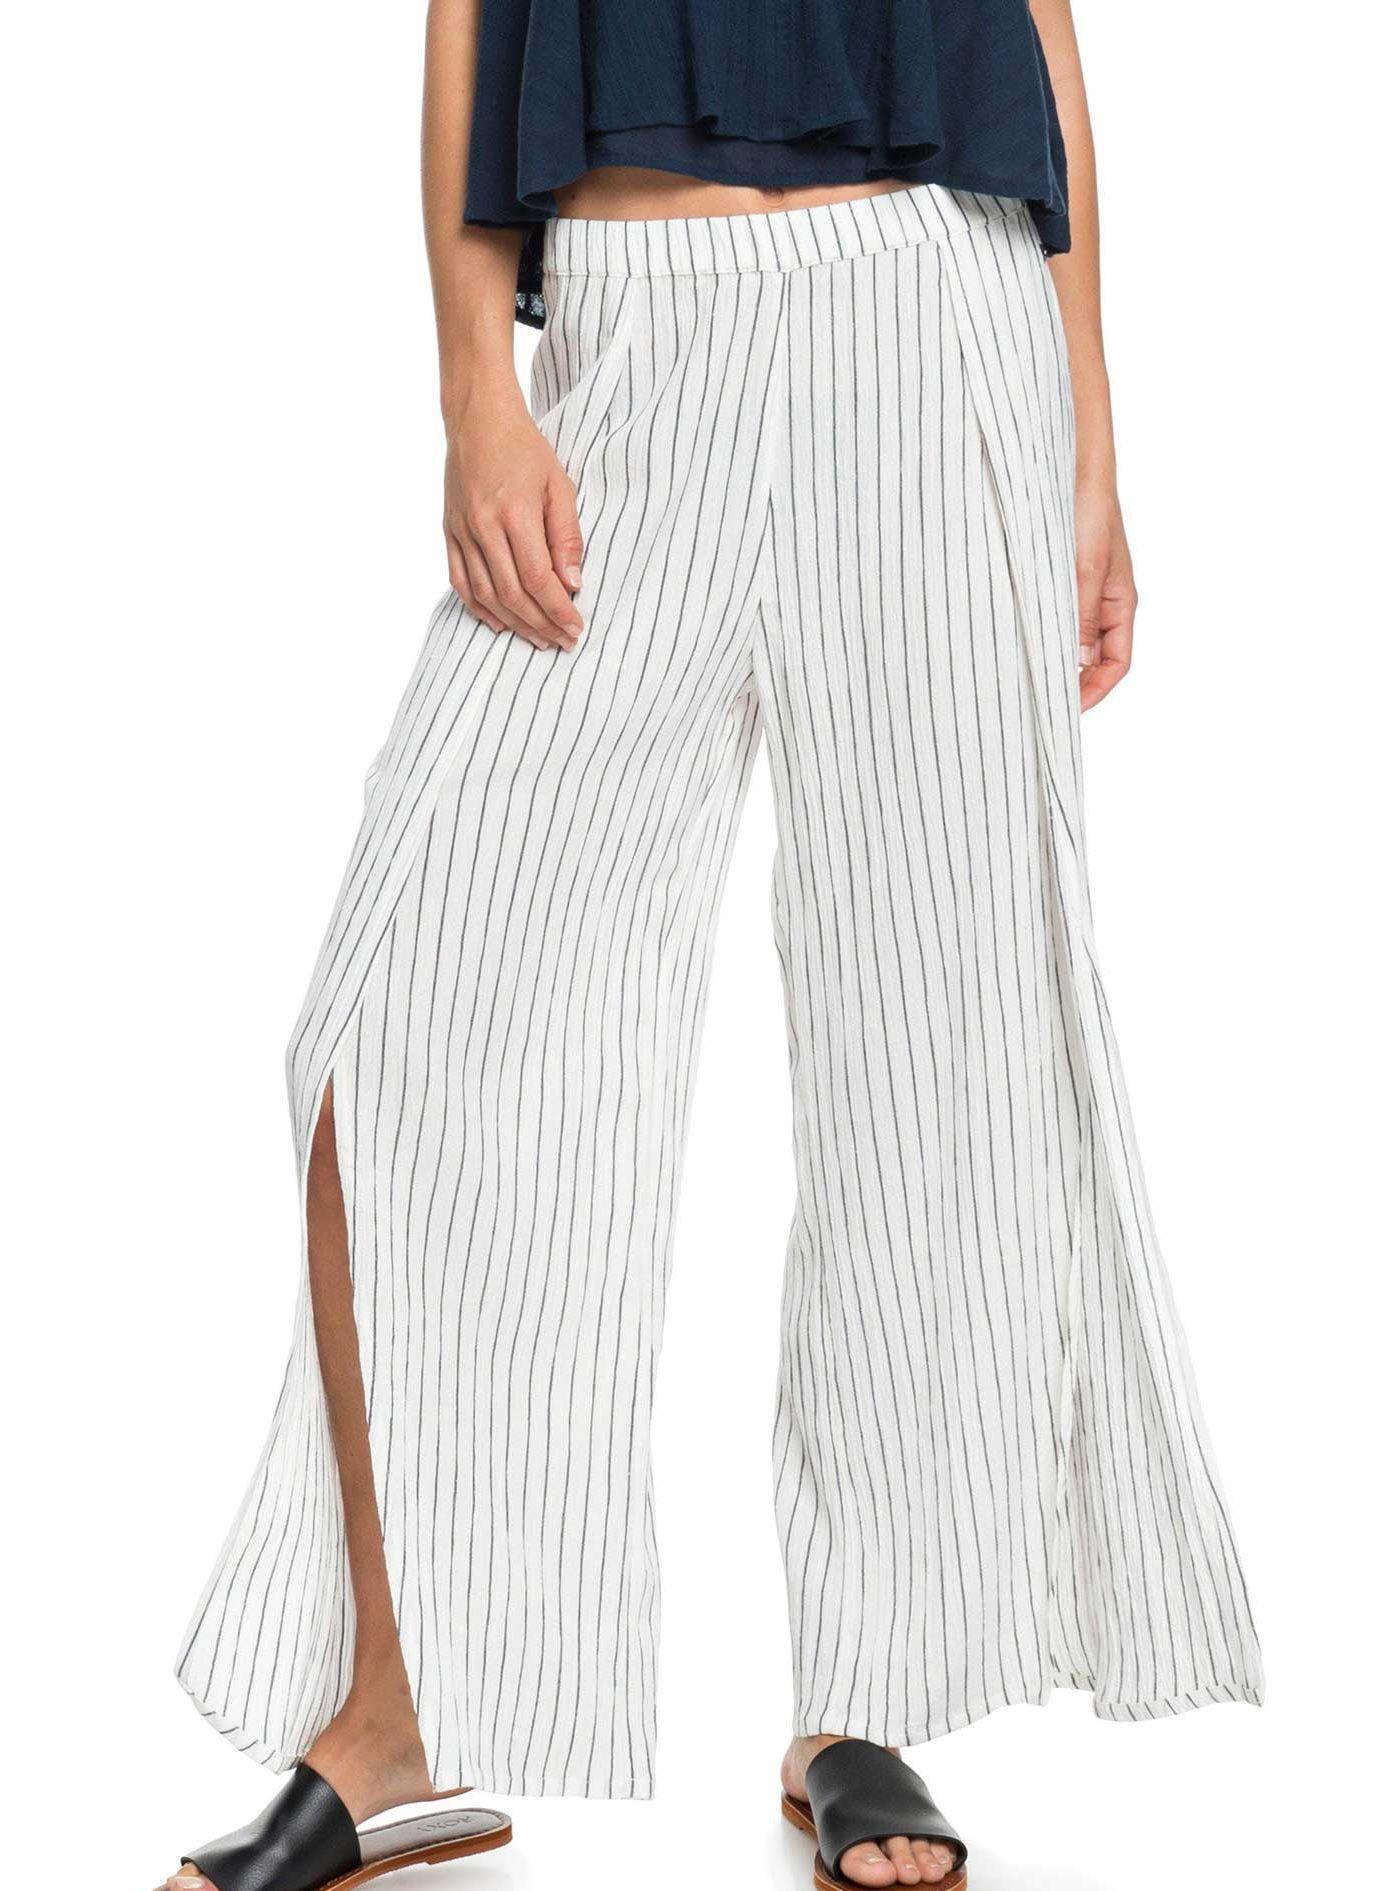 Roxy Women's Adventure Pants